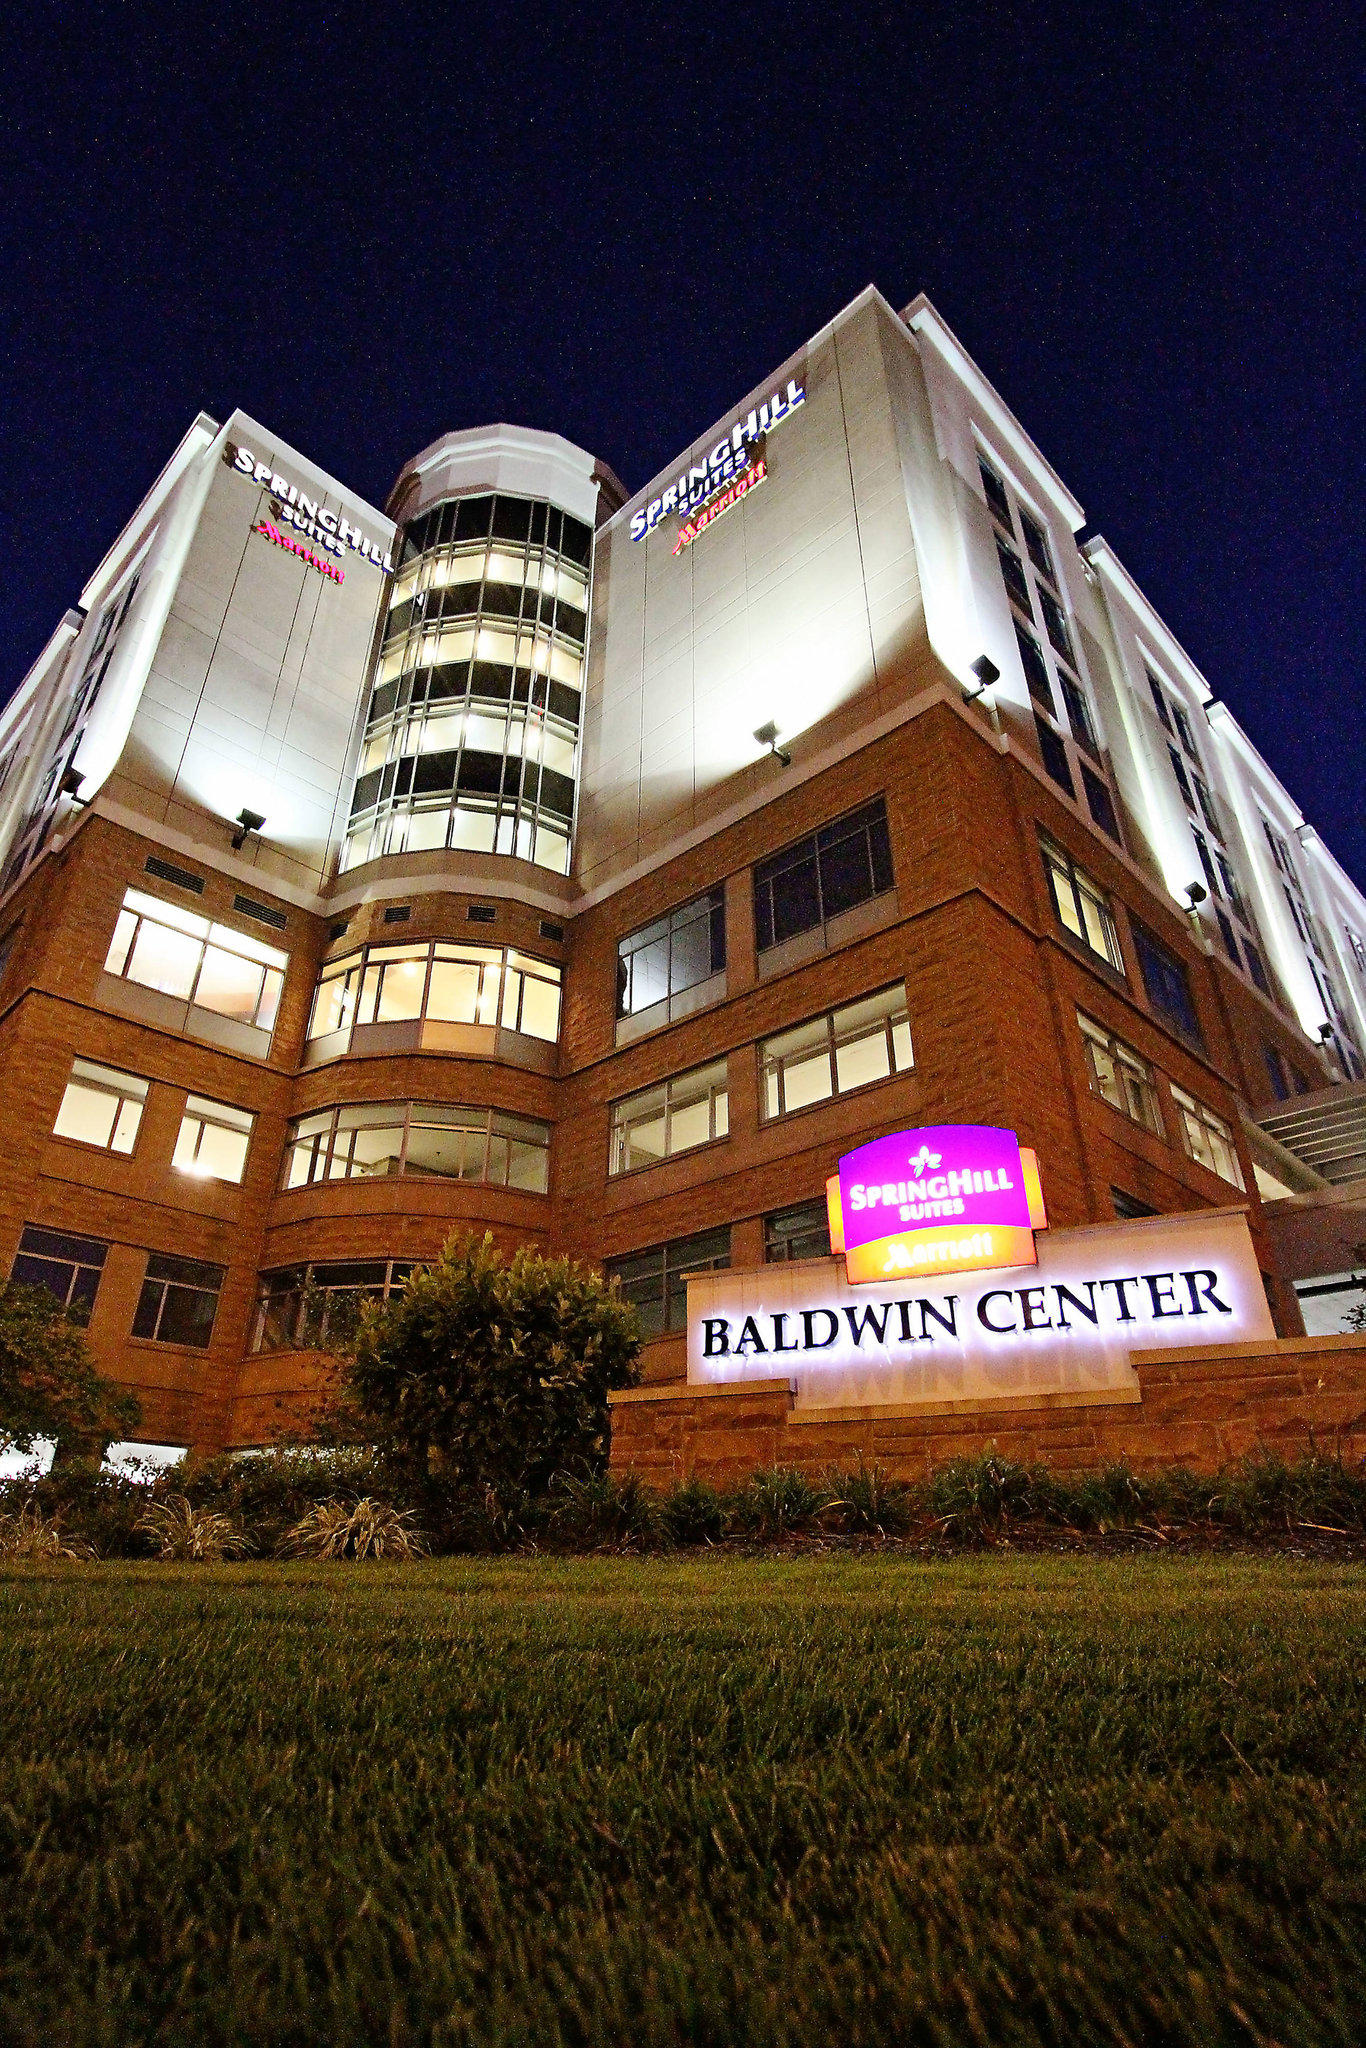 Convention Center Expansion And Hotel Development In Cincinnati Region